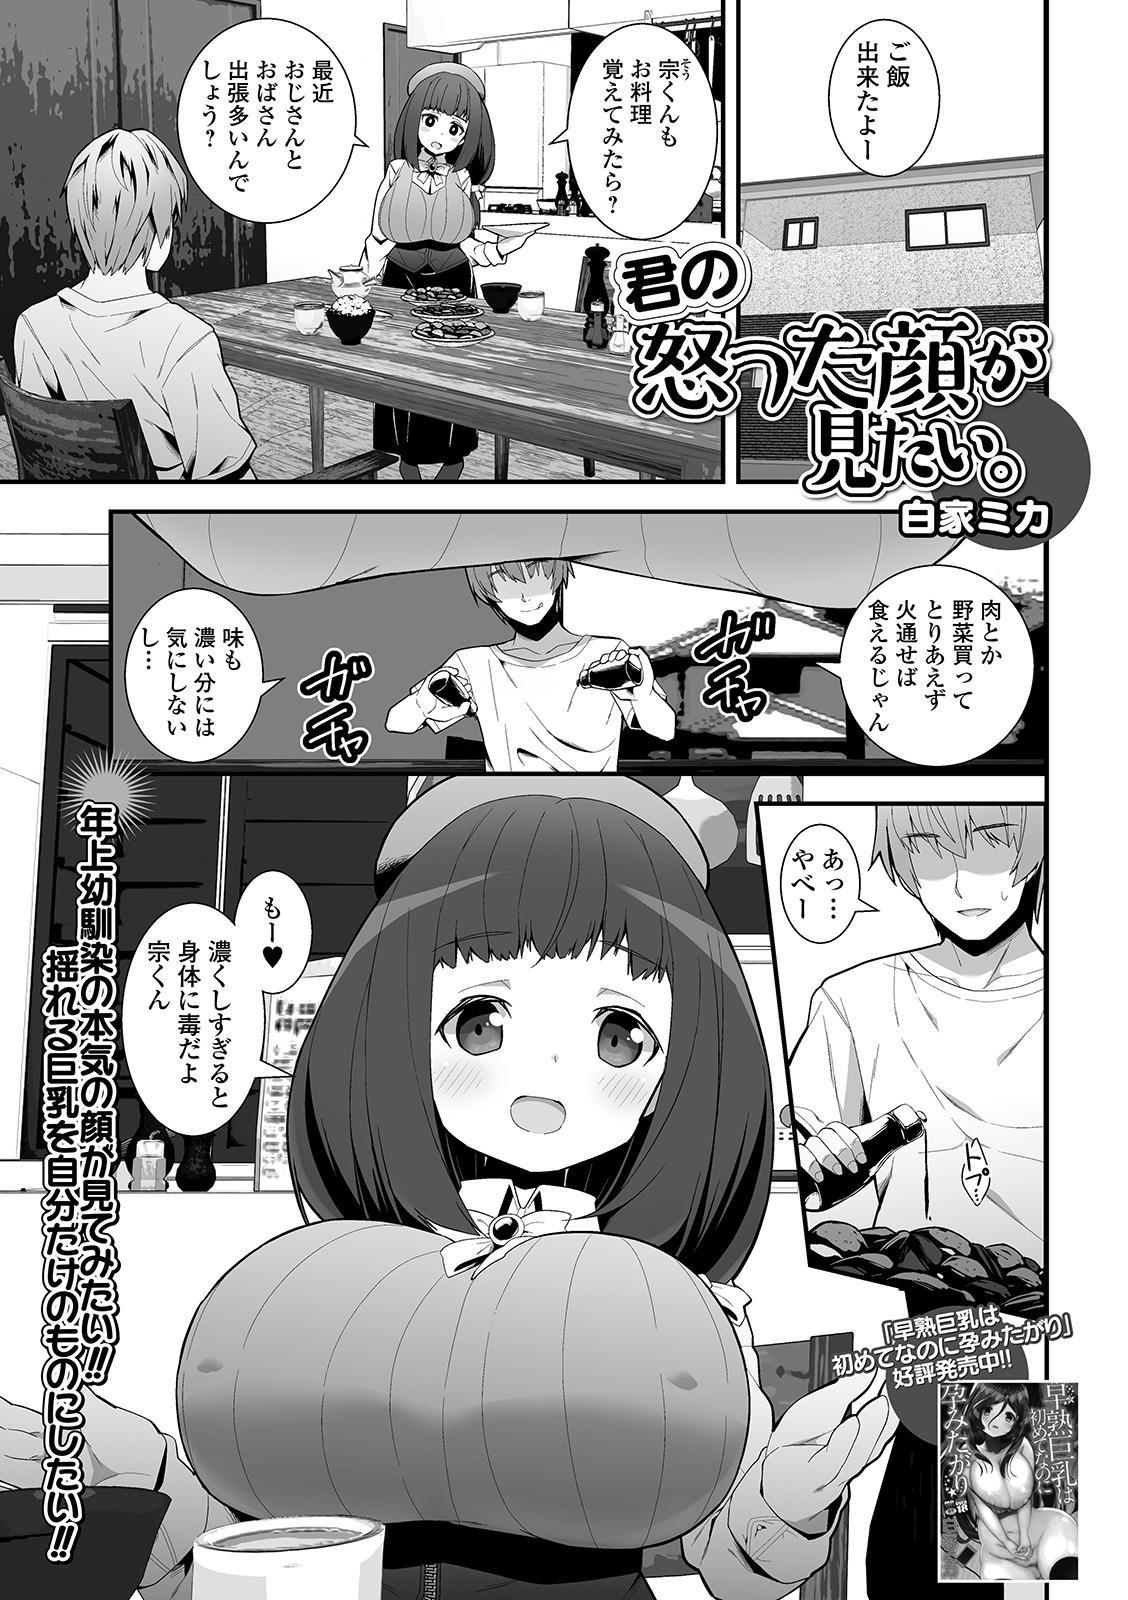 COMIC Shigekiteki SQUIRT!! Vol. 15 170